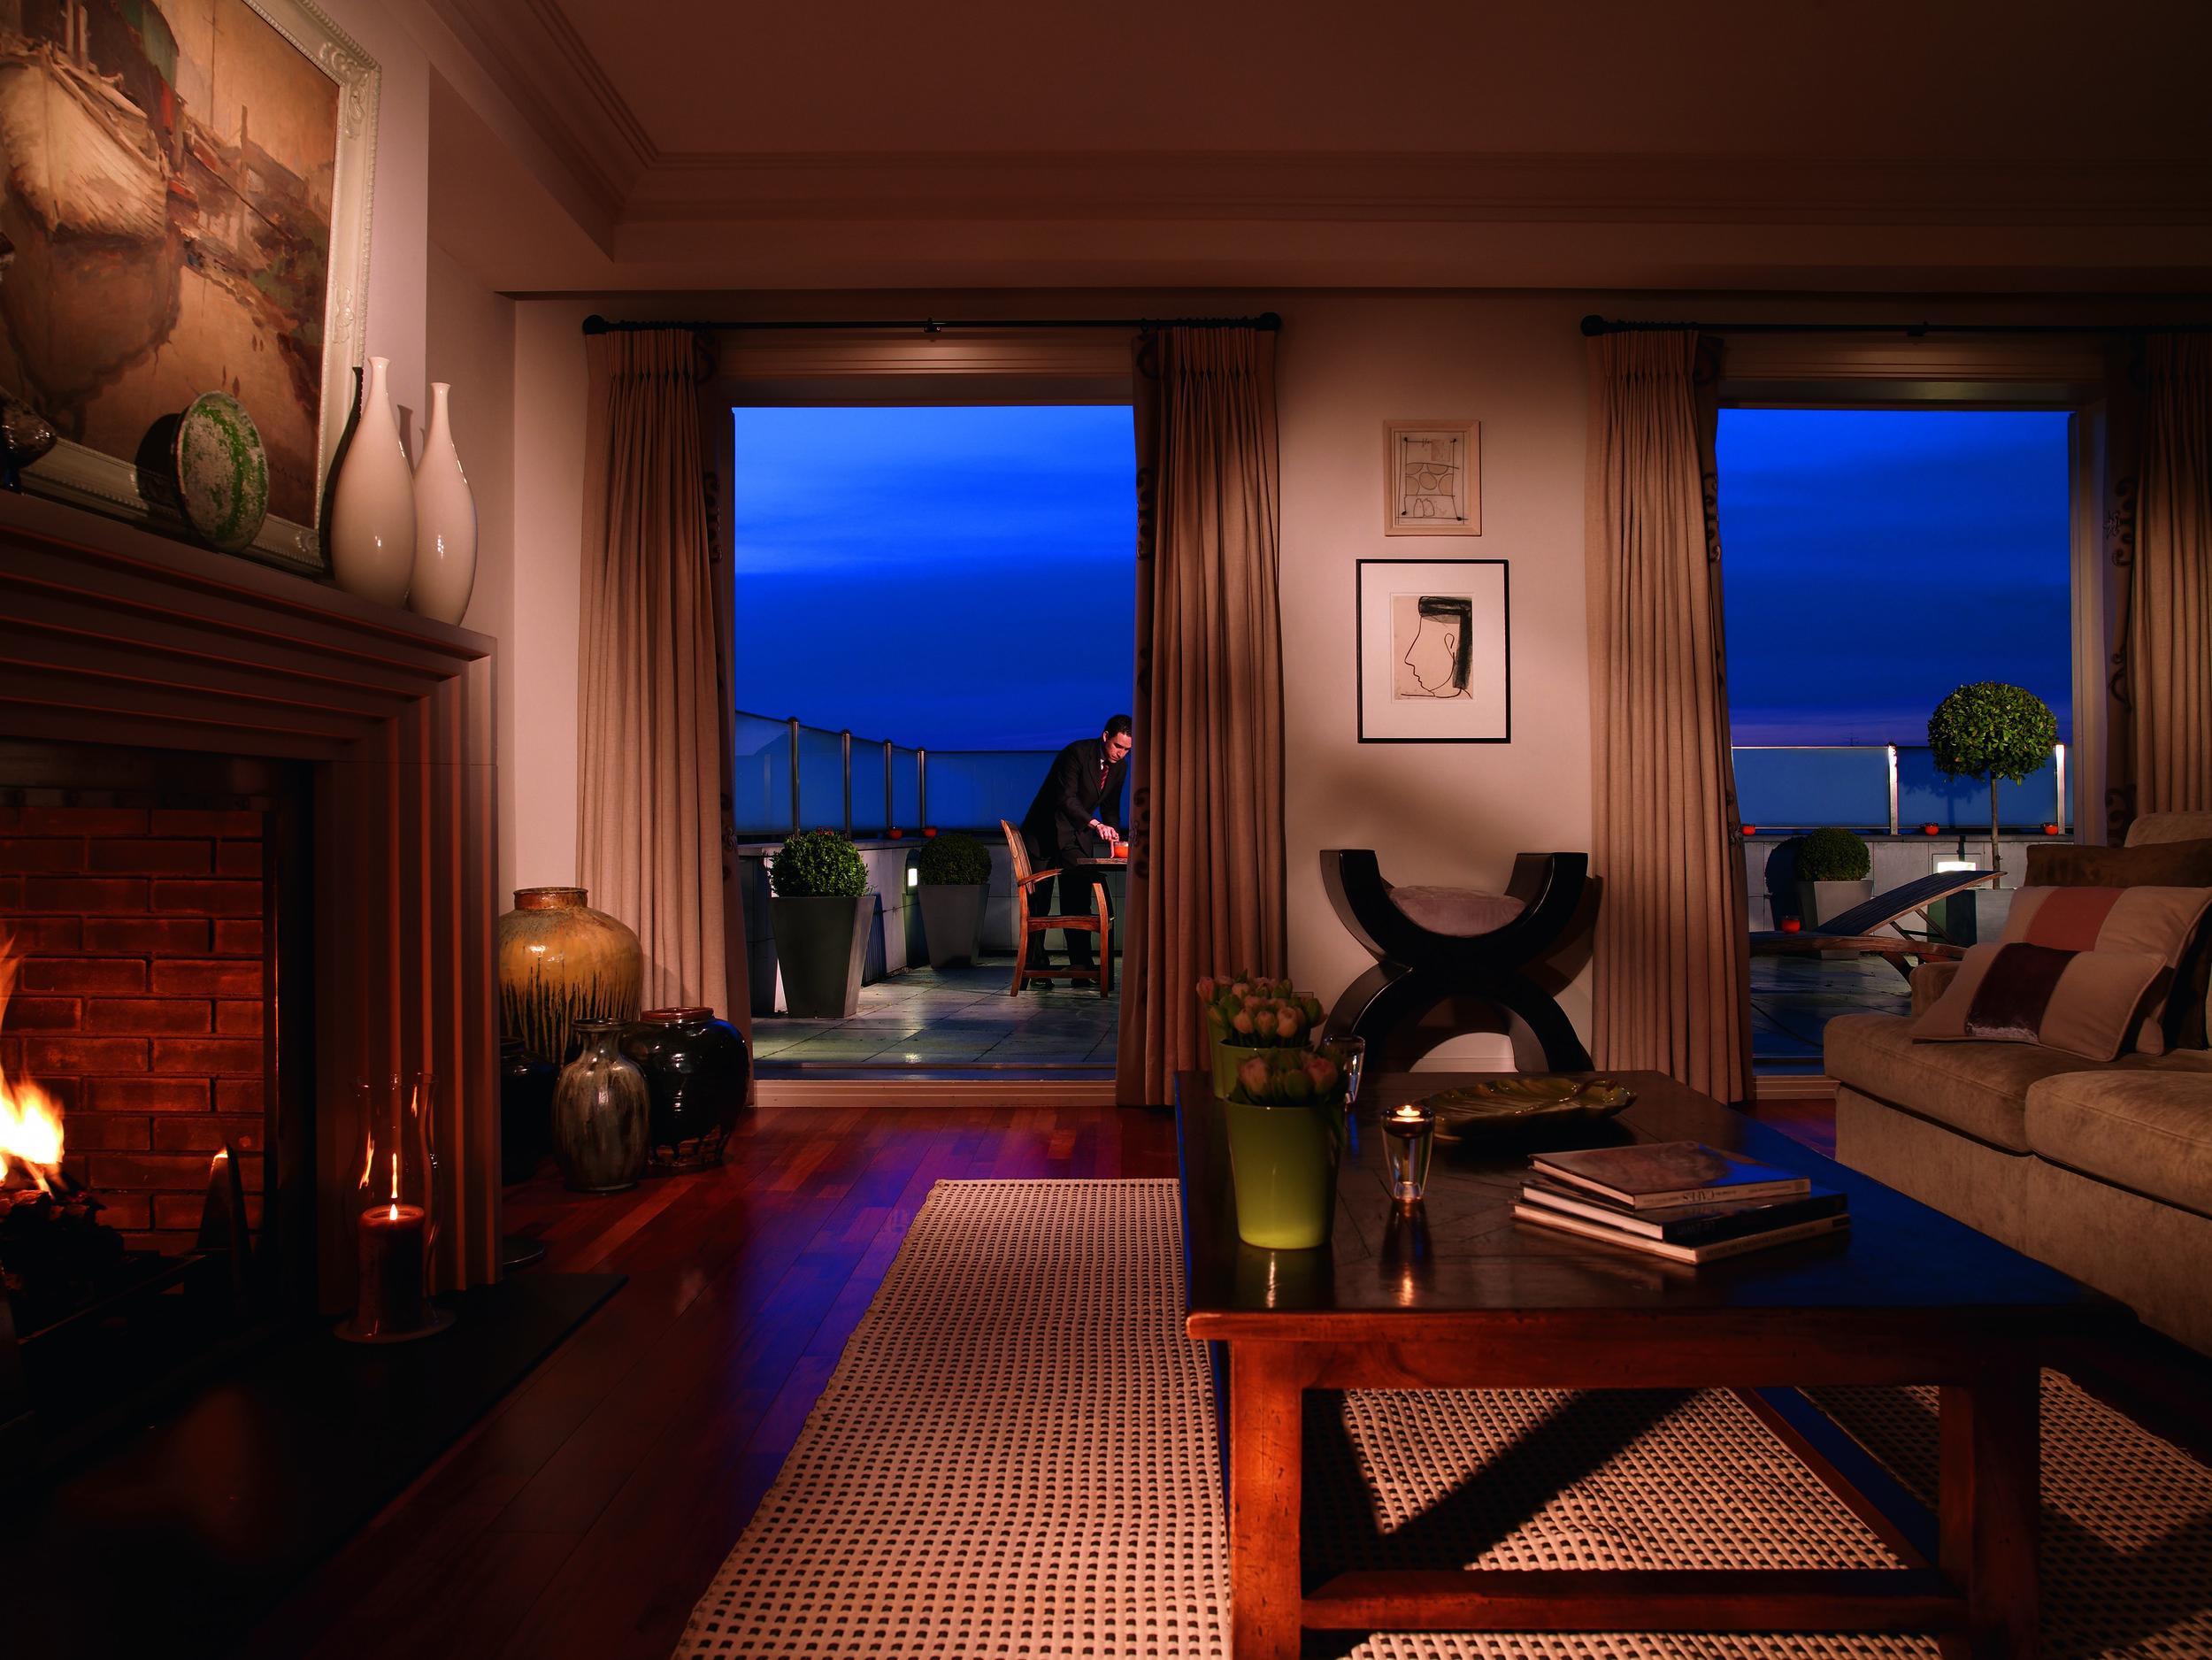 10 RFH Hotel Amigo - Blaton Suite Living Room Aug 08 A Houston.jpg